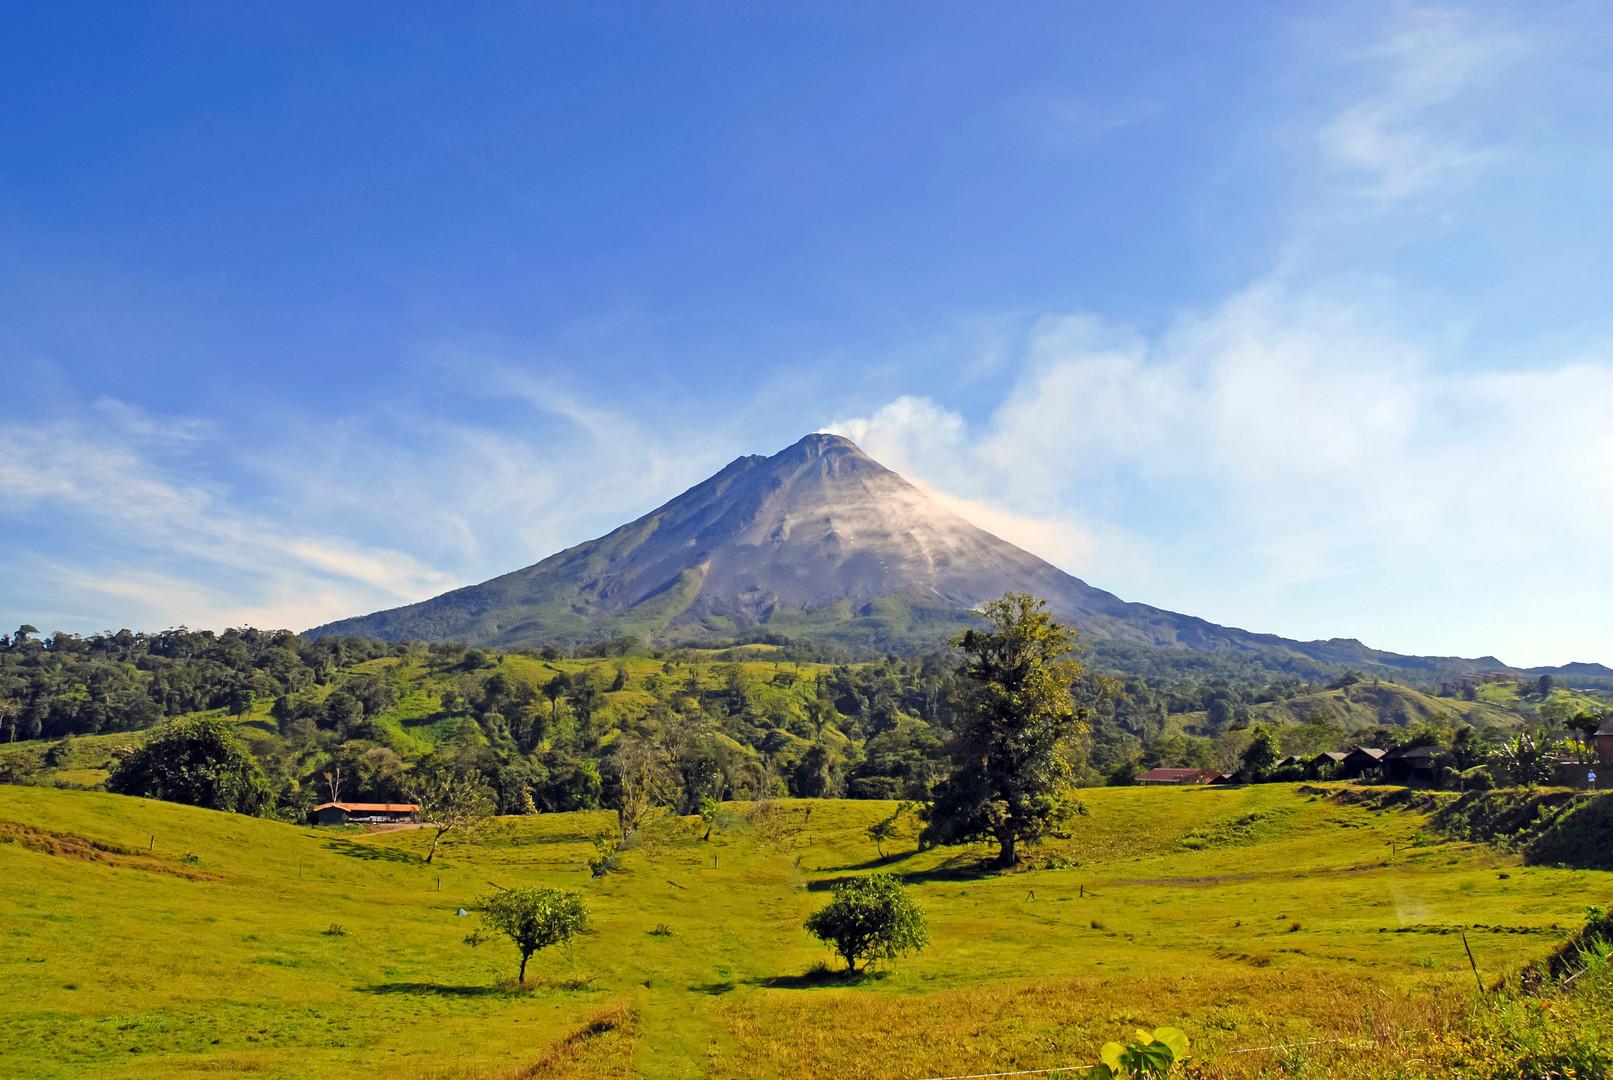 visita-al-volcán-Arenal-1.jpg